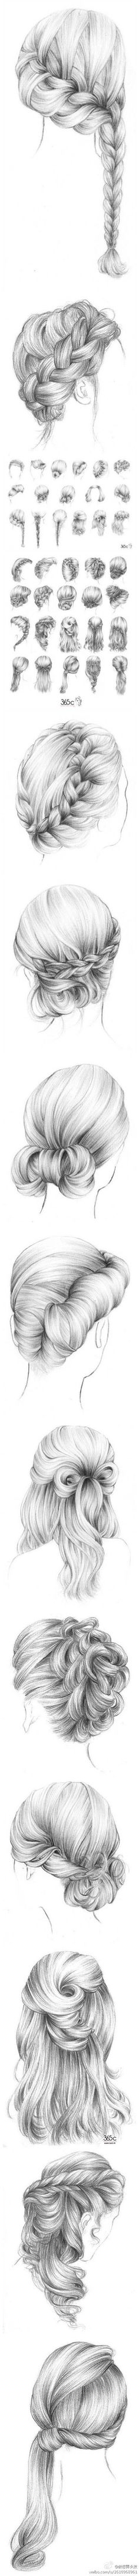 Lots of cute hair drawings Repin & like. Listen to #NoelitoFlow http://www.twitter.com/noelitoflow http://www.instagram.com/rockstarking http://www.facebook.com/thisisflow #drawinghair